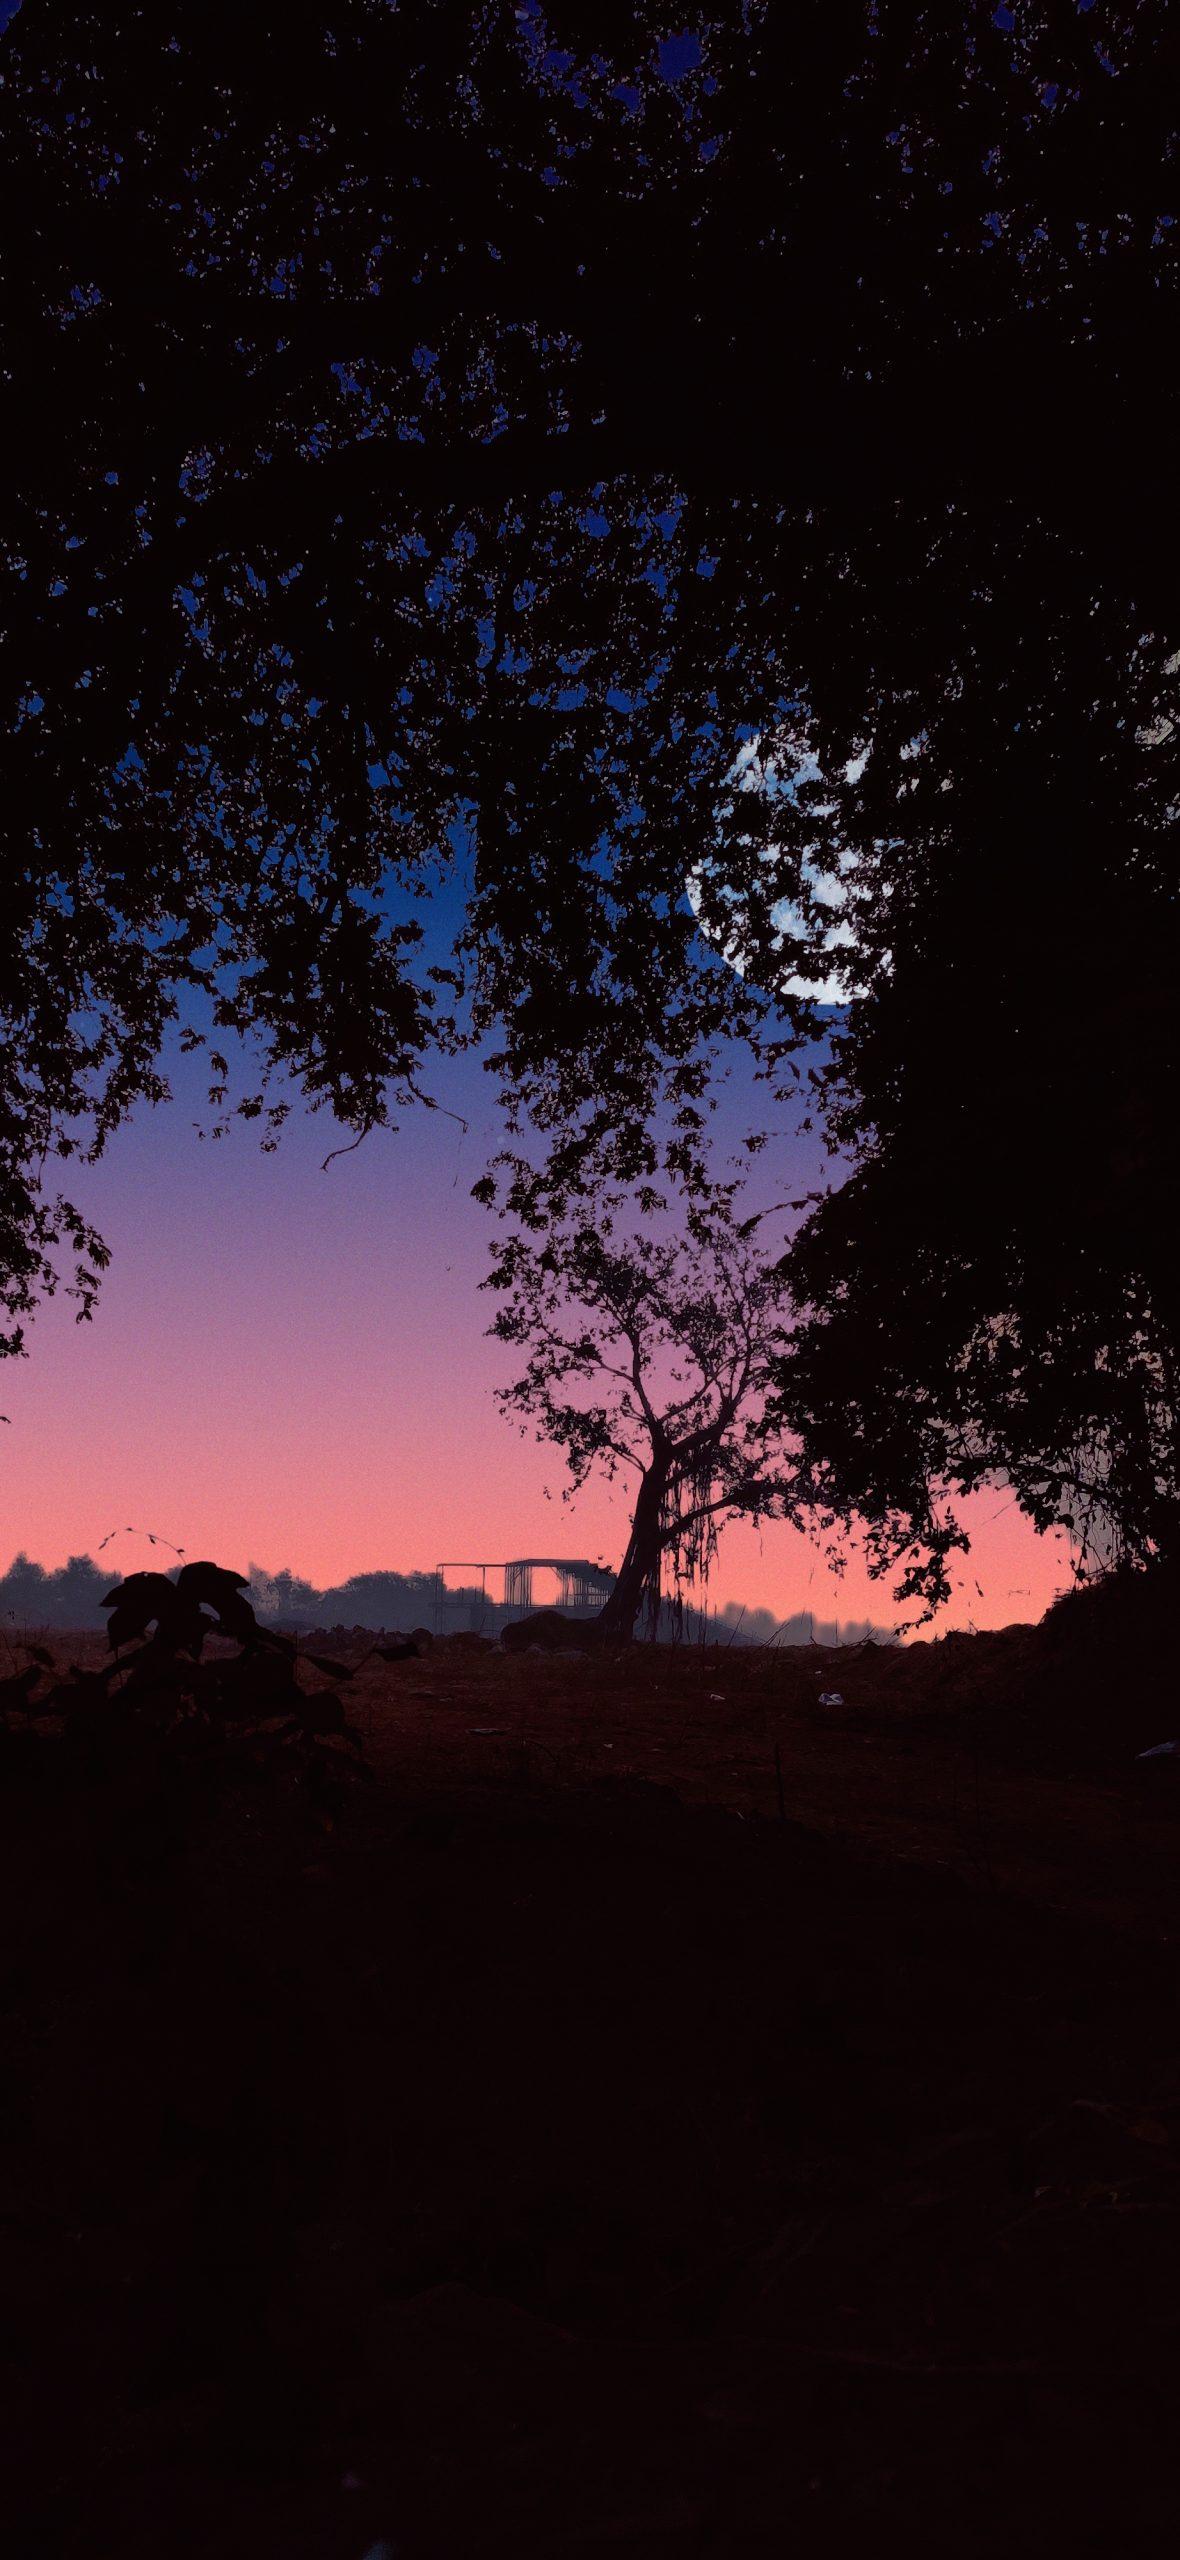 Moon behind the tree